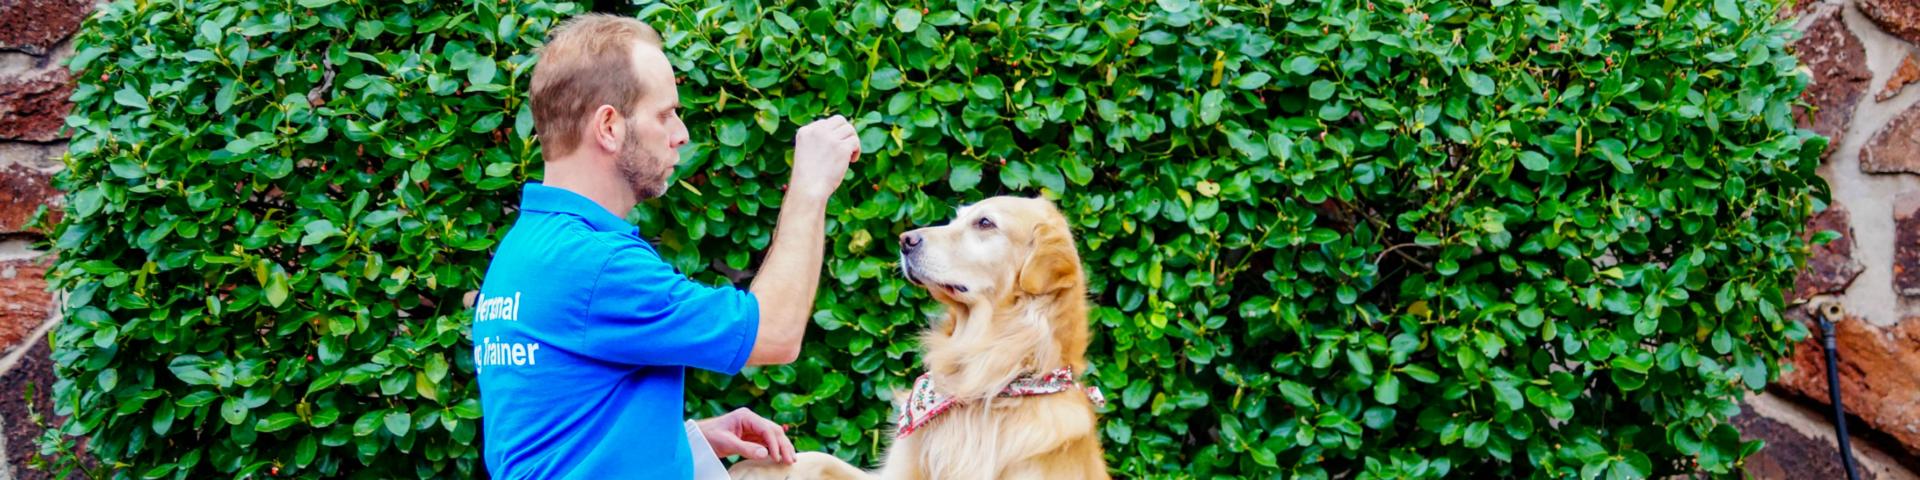 Dog Training St Louis Kennelwood Pet Resorts